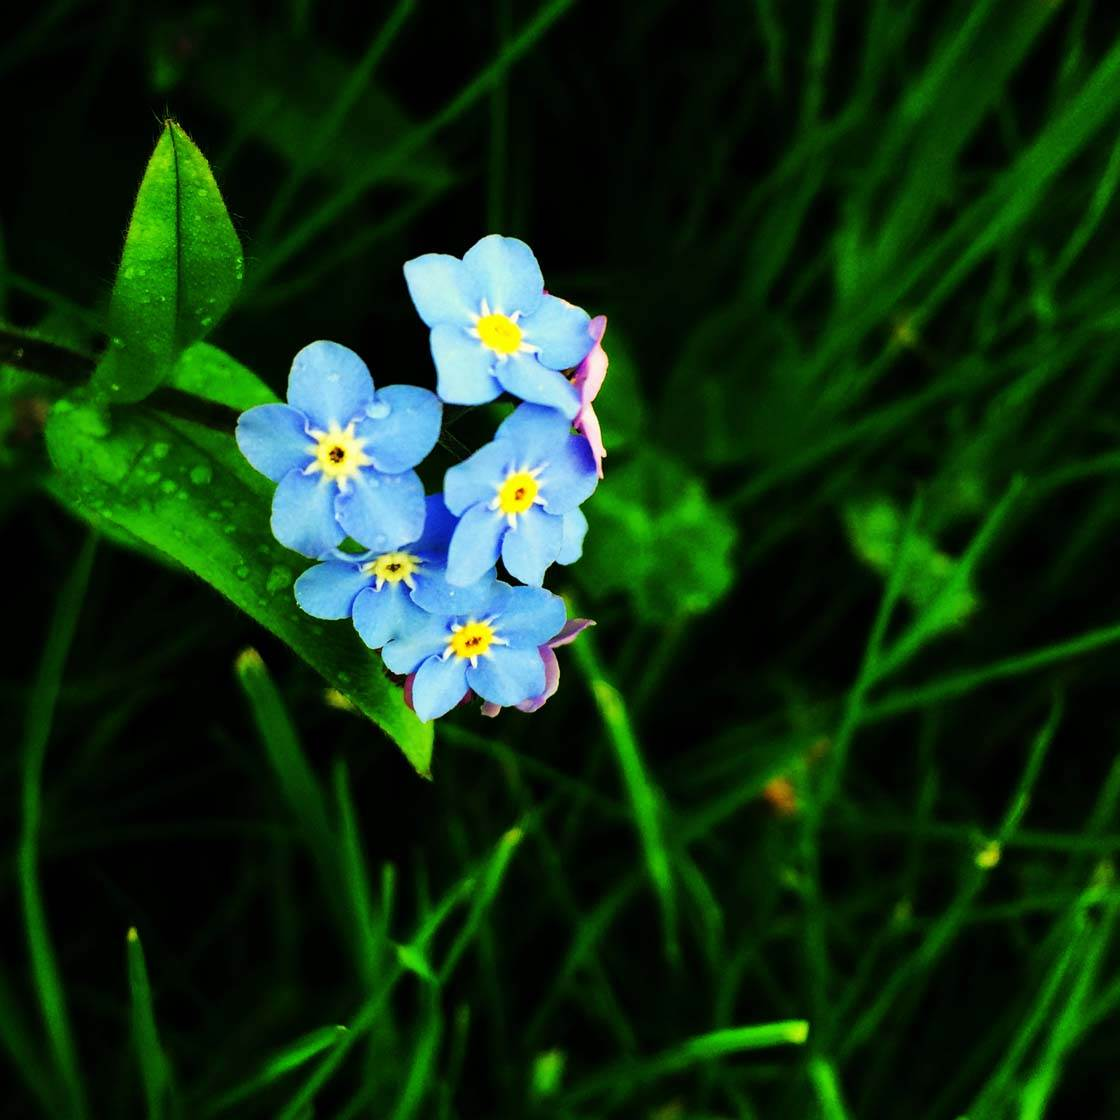 iPhone Flower Photography 7 no script